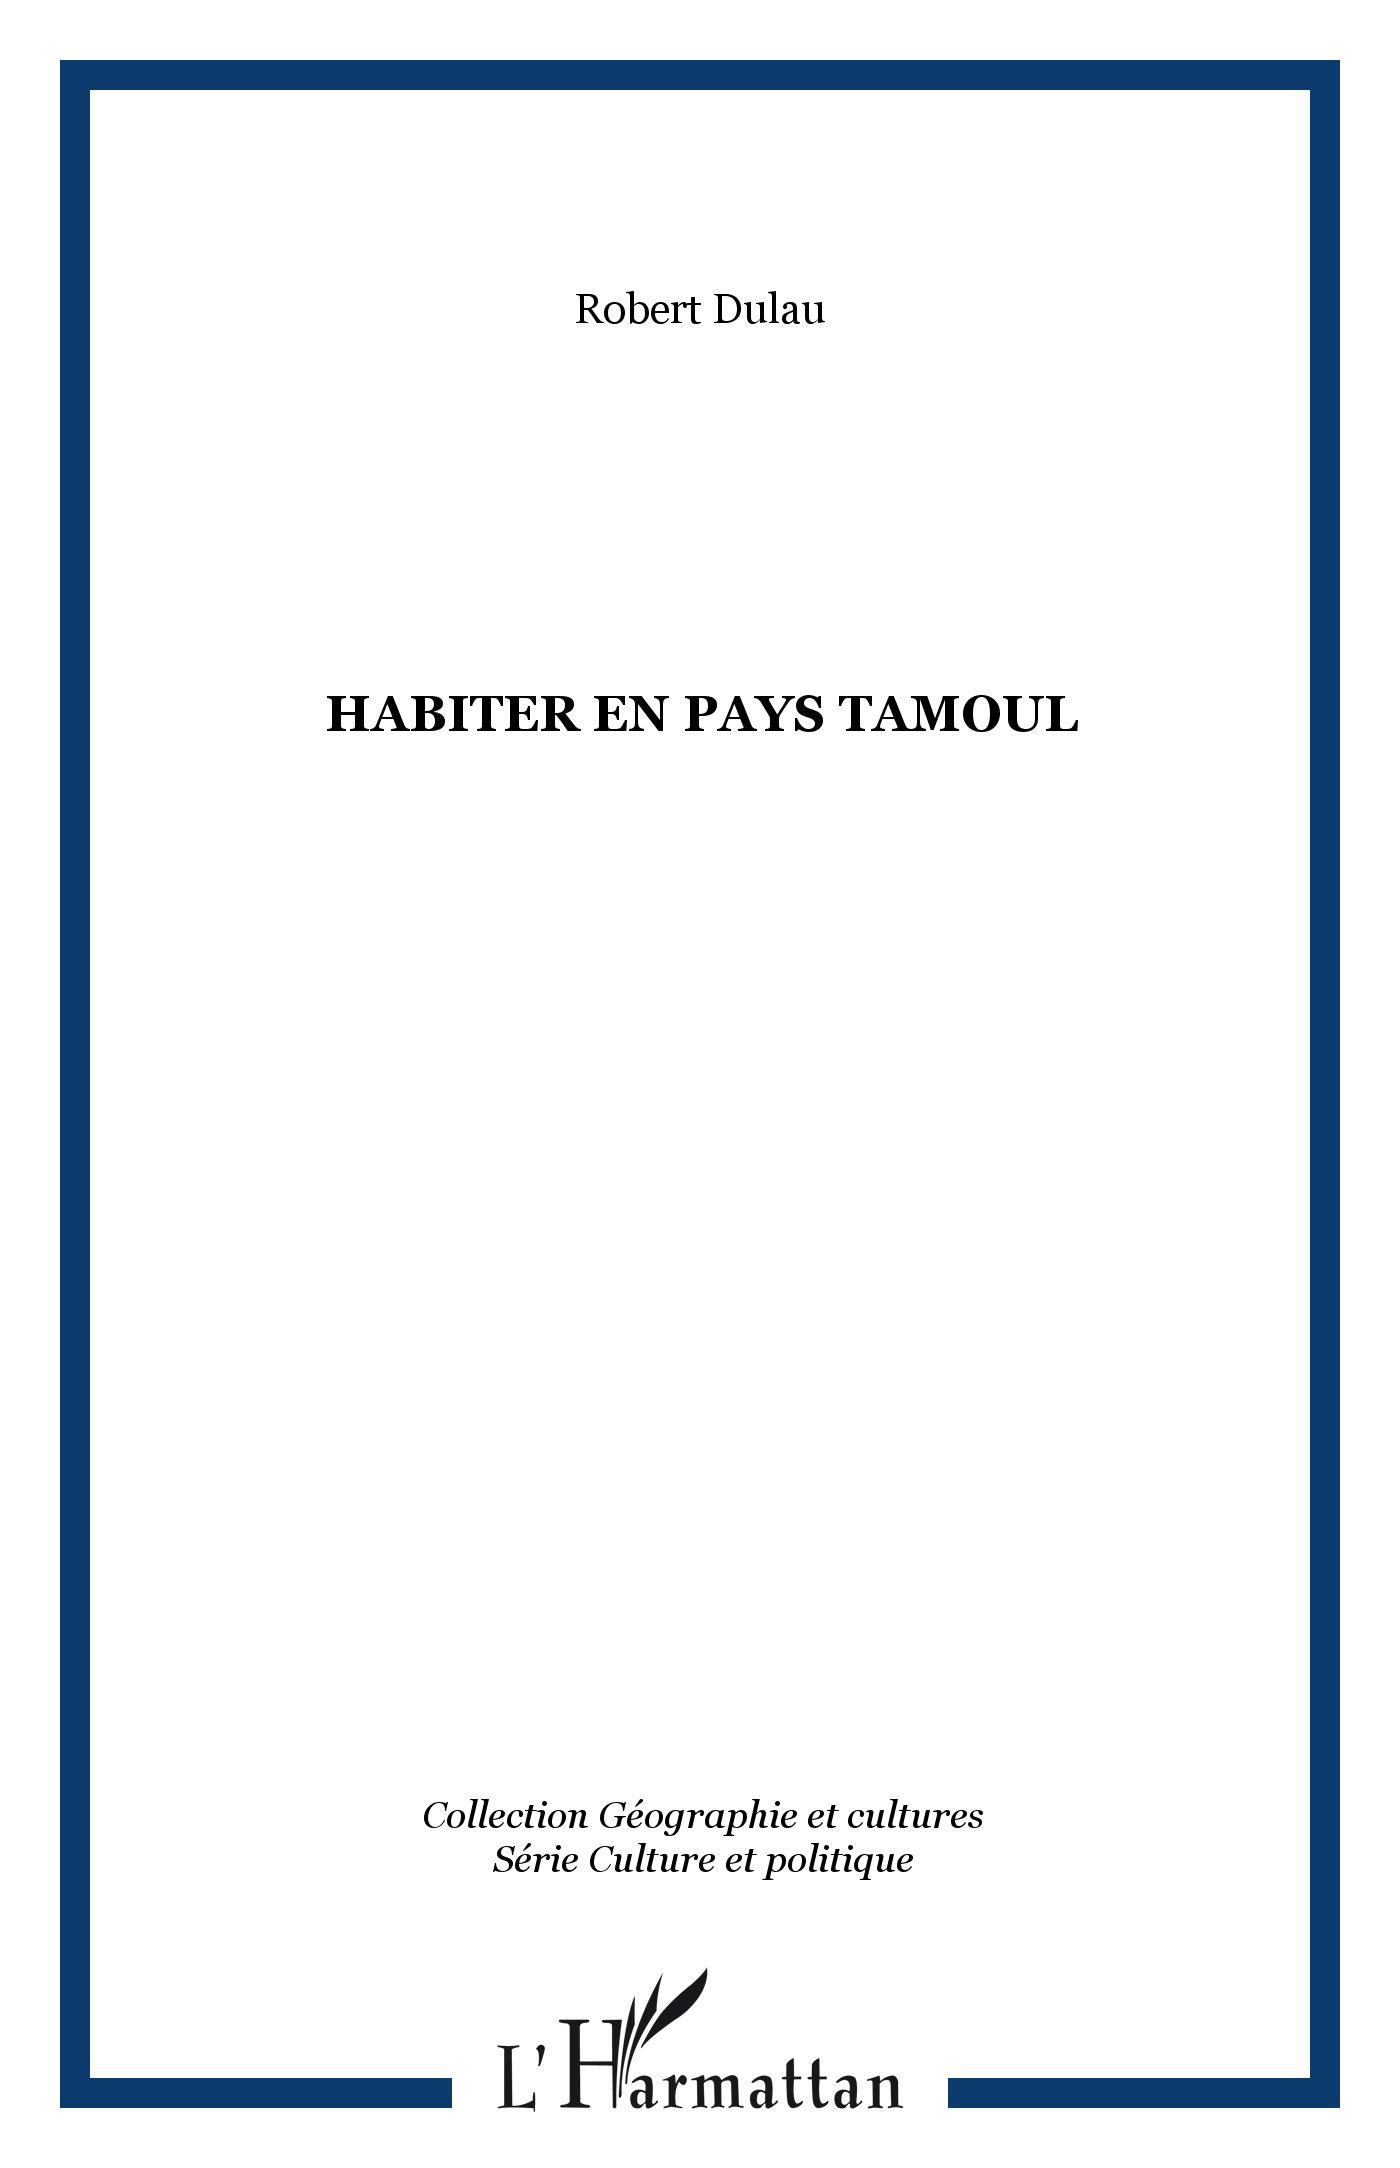 HABITER EN PAYS TAMOUL